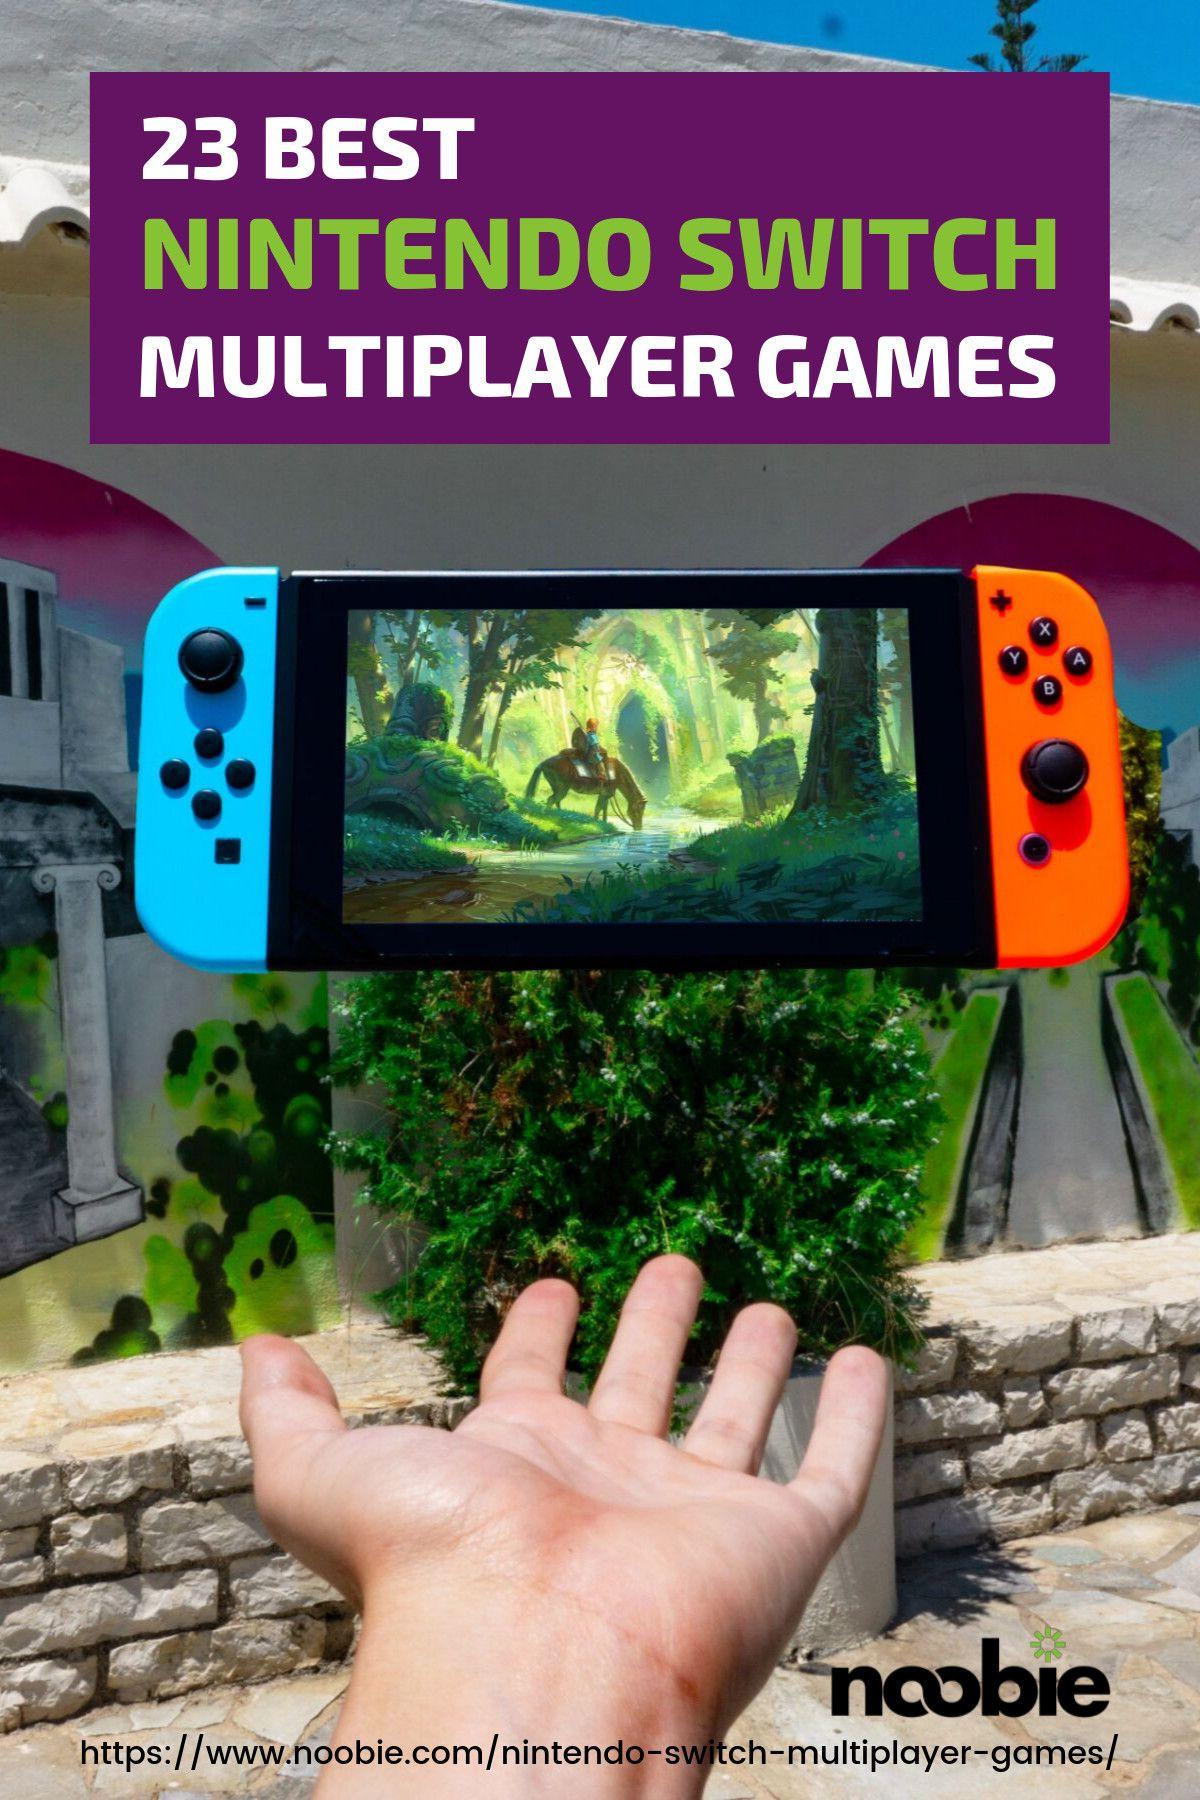 23 Best Nintendo Switch Multiplayer Games Noobie Multiplayer Games Nintendo Switch System Nintendo Switch